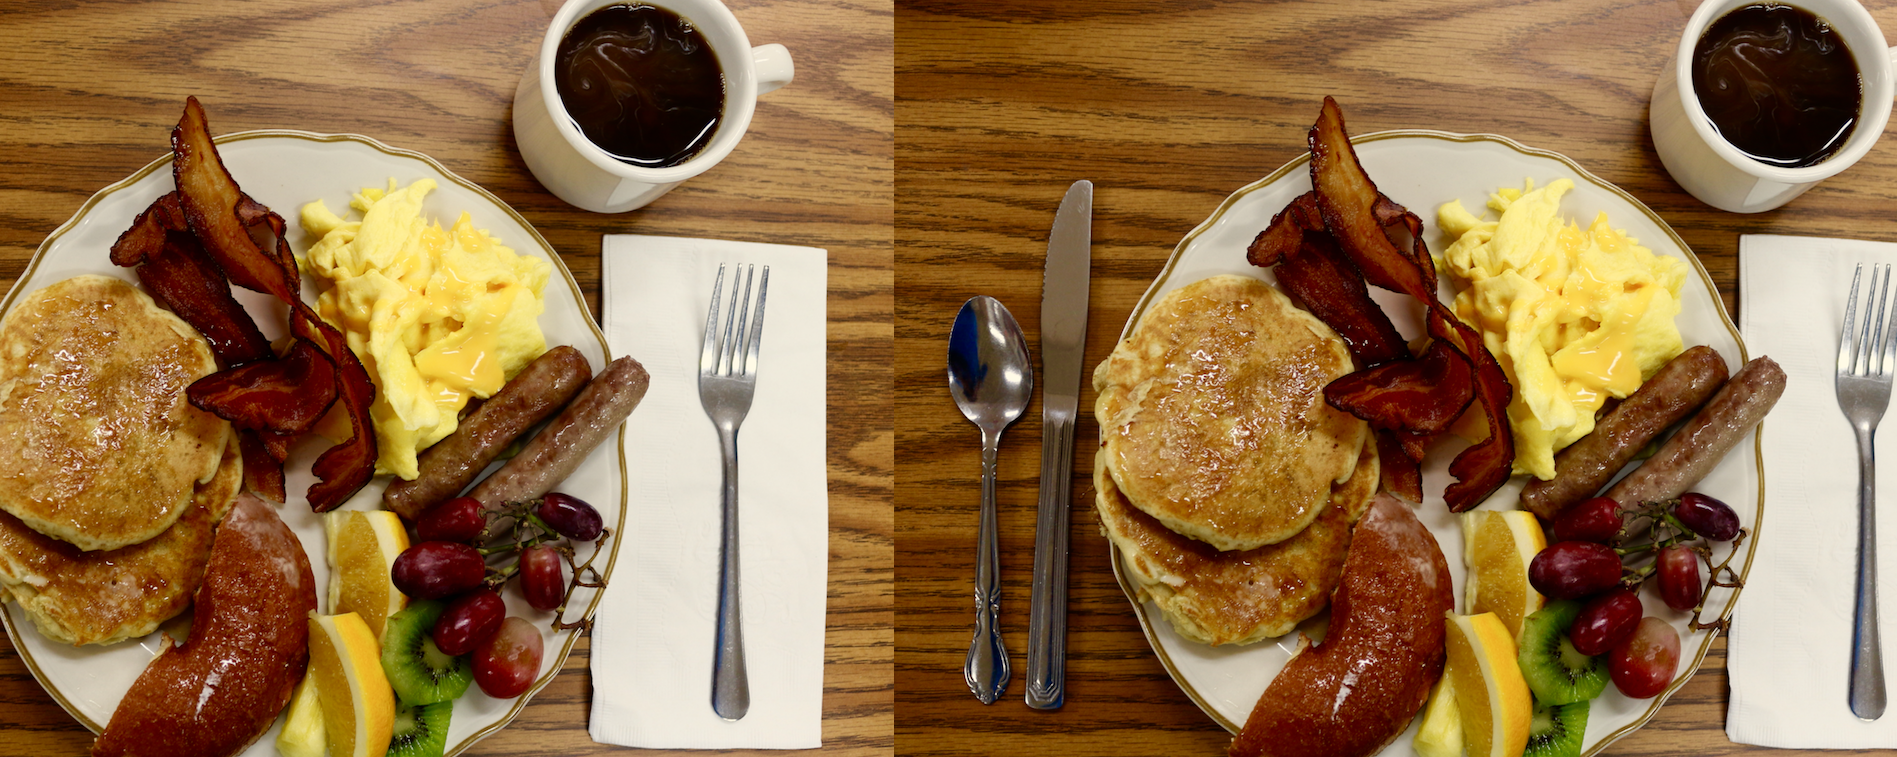 Breakfast Buffet at Kinzers Fire Hall 11/25